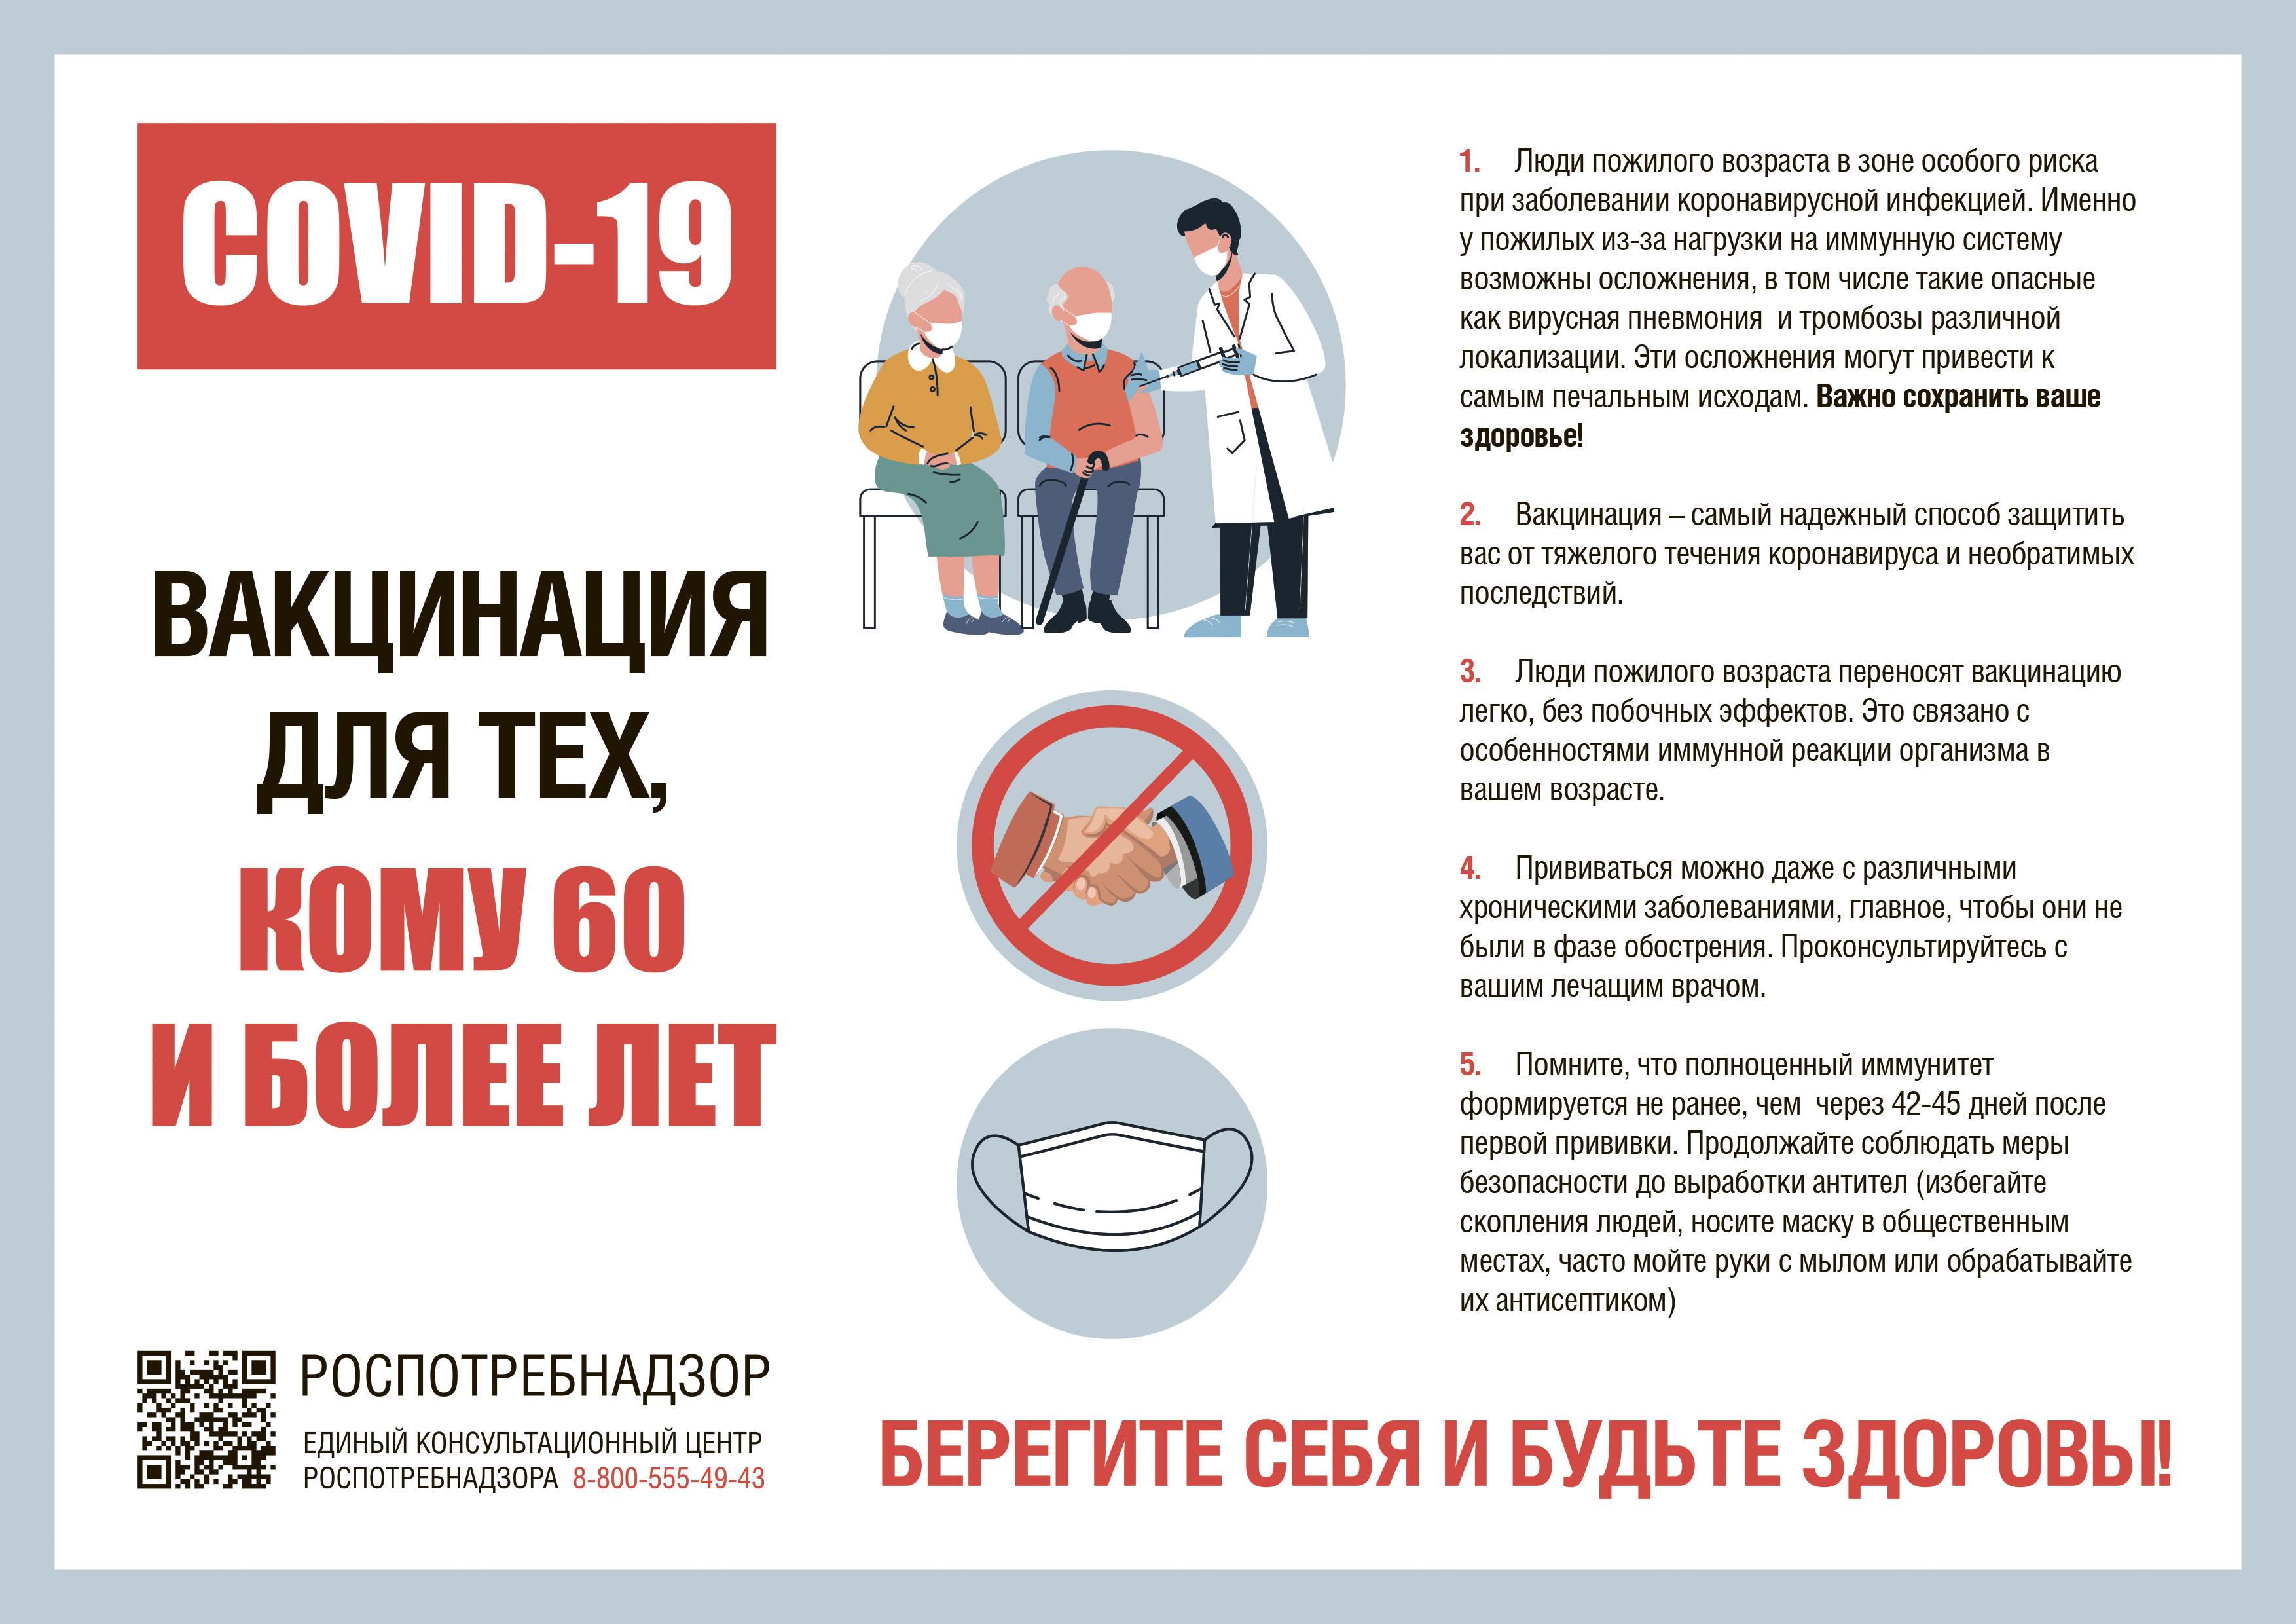 https://www.rospotrebnadzor.ru/files/news2/2021/06/A4%2060_plus.jpg